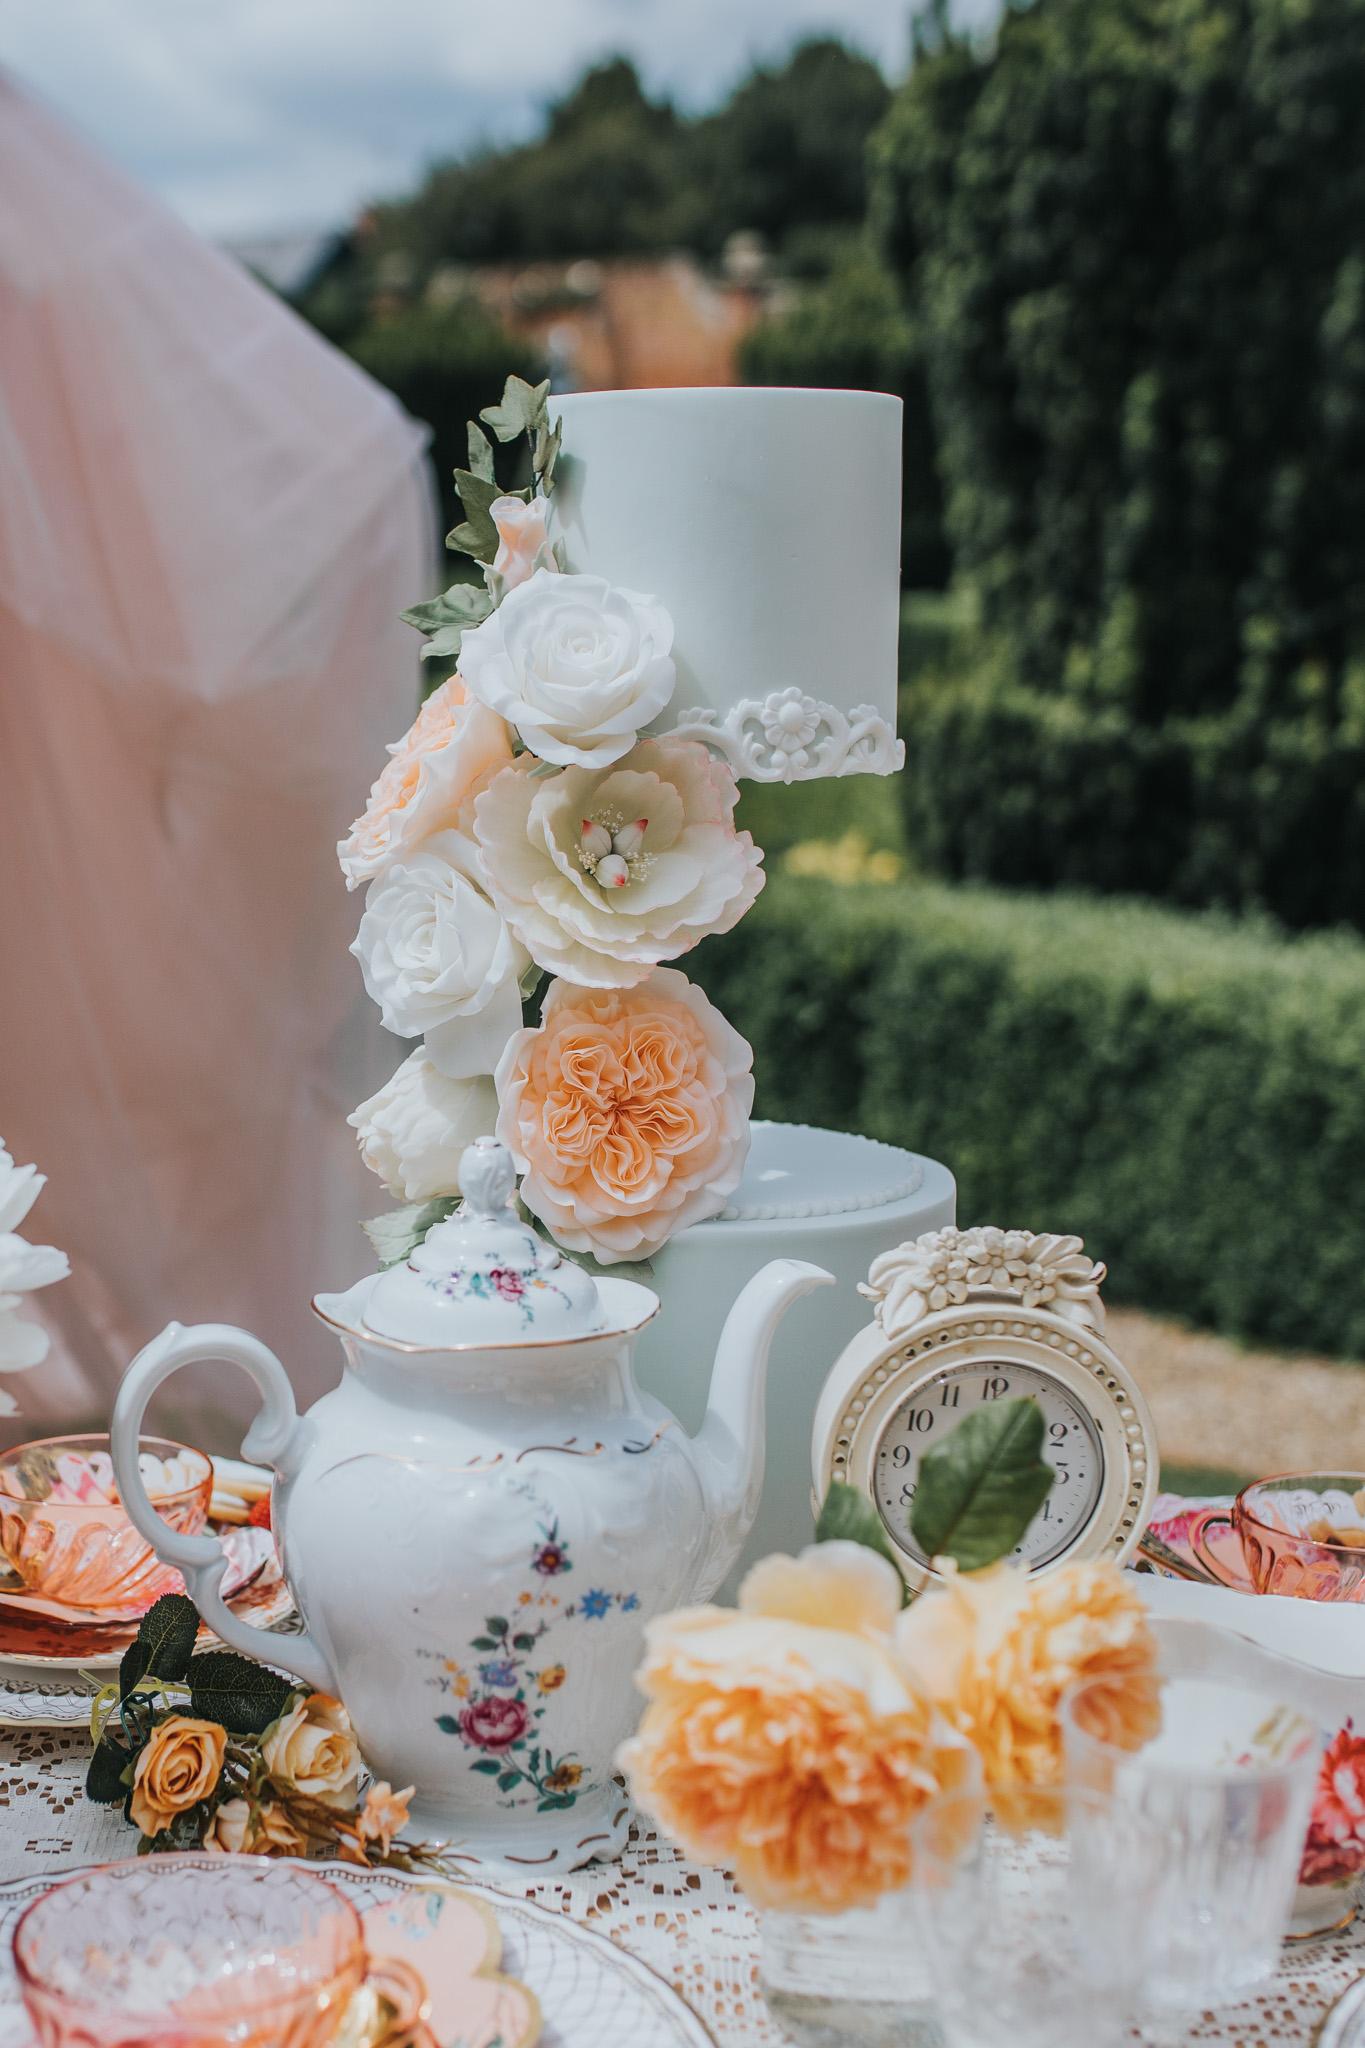 bridgerton wedding - regency wedding - whimsical wedding - vintage wedding- unique wedding ideas - unconventional wedding - unique wedding cake - wedding tea party